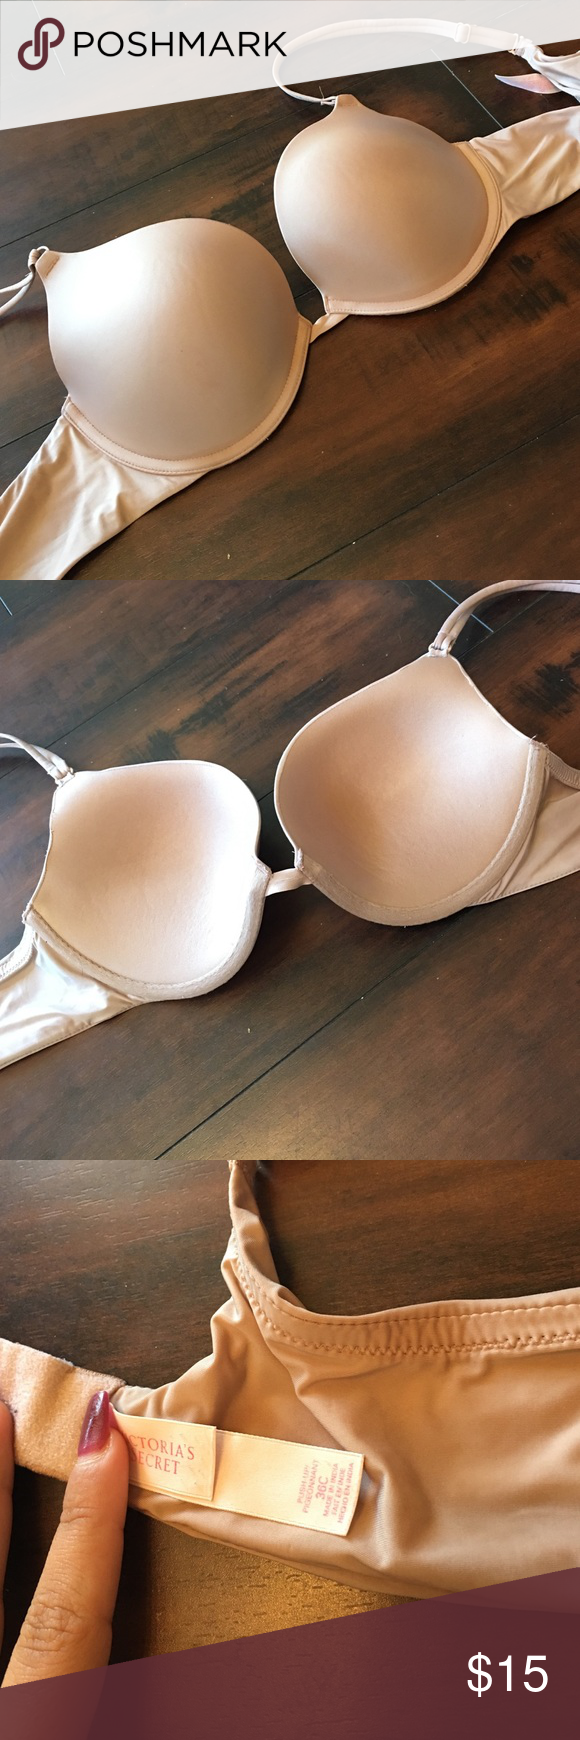 Victoria's Secret bra Victoria's Secret push up bra size 36C Victoria's Secret Intimates & Sleepwear Bras